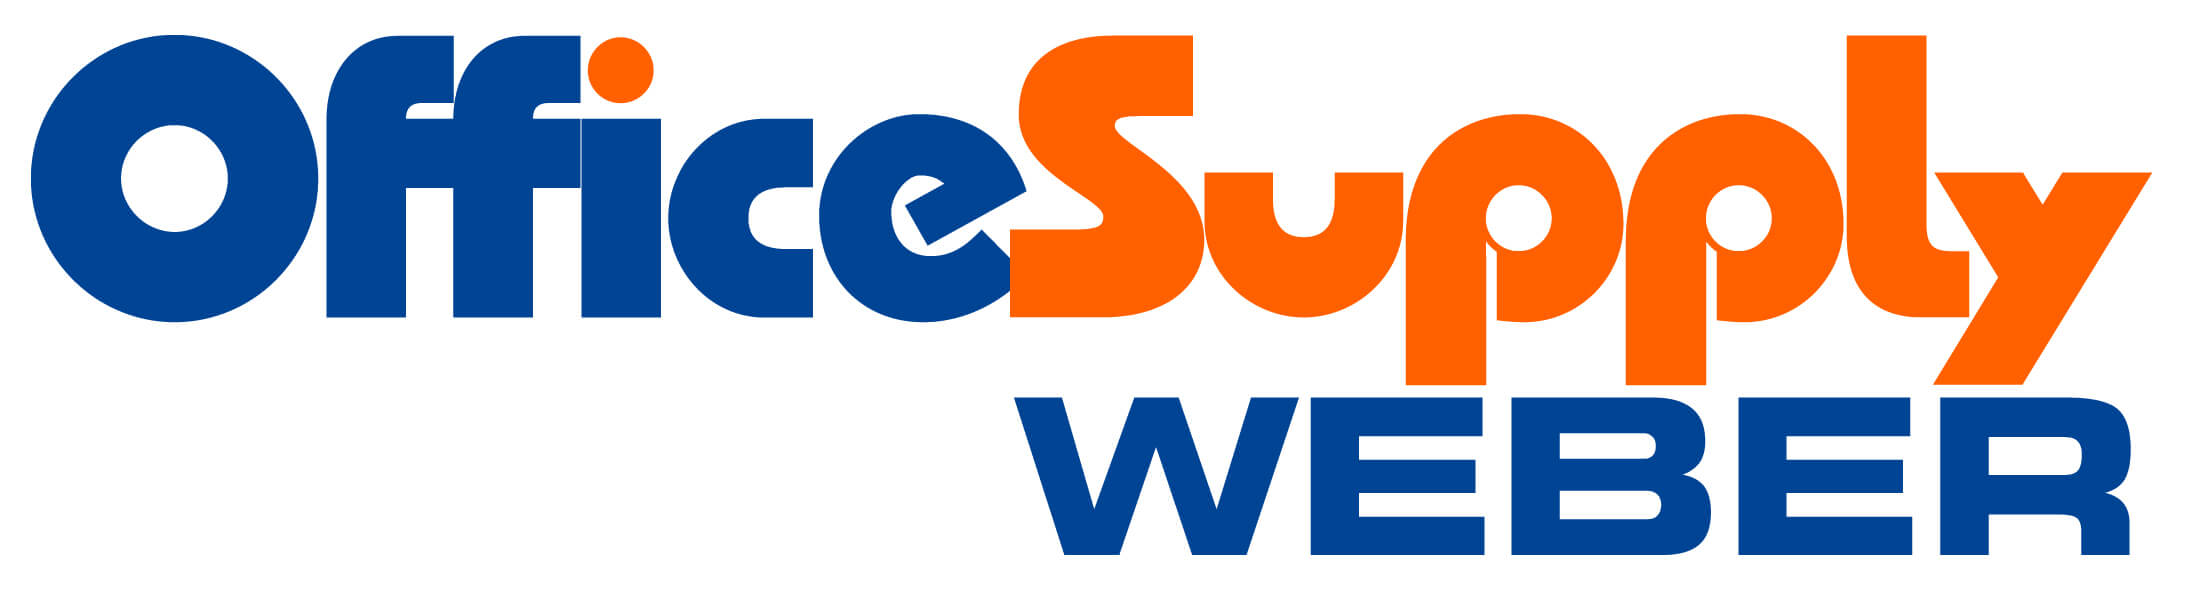 OfficeSupply WEBER